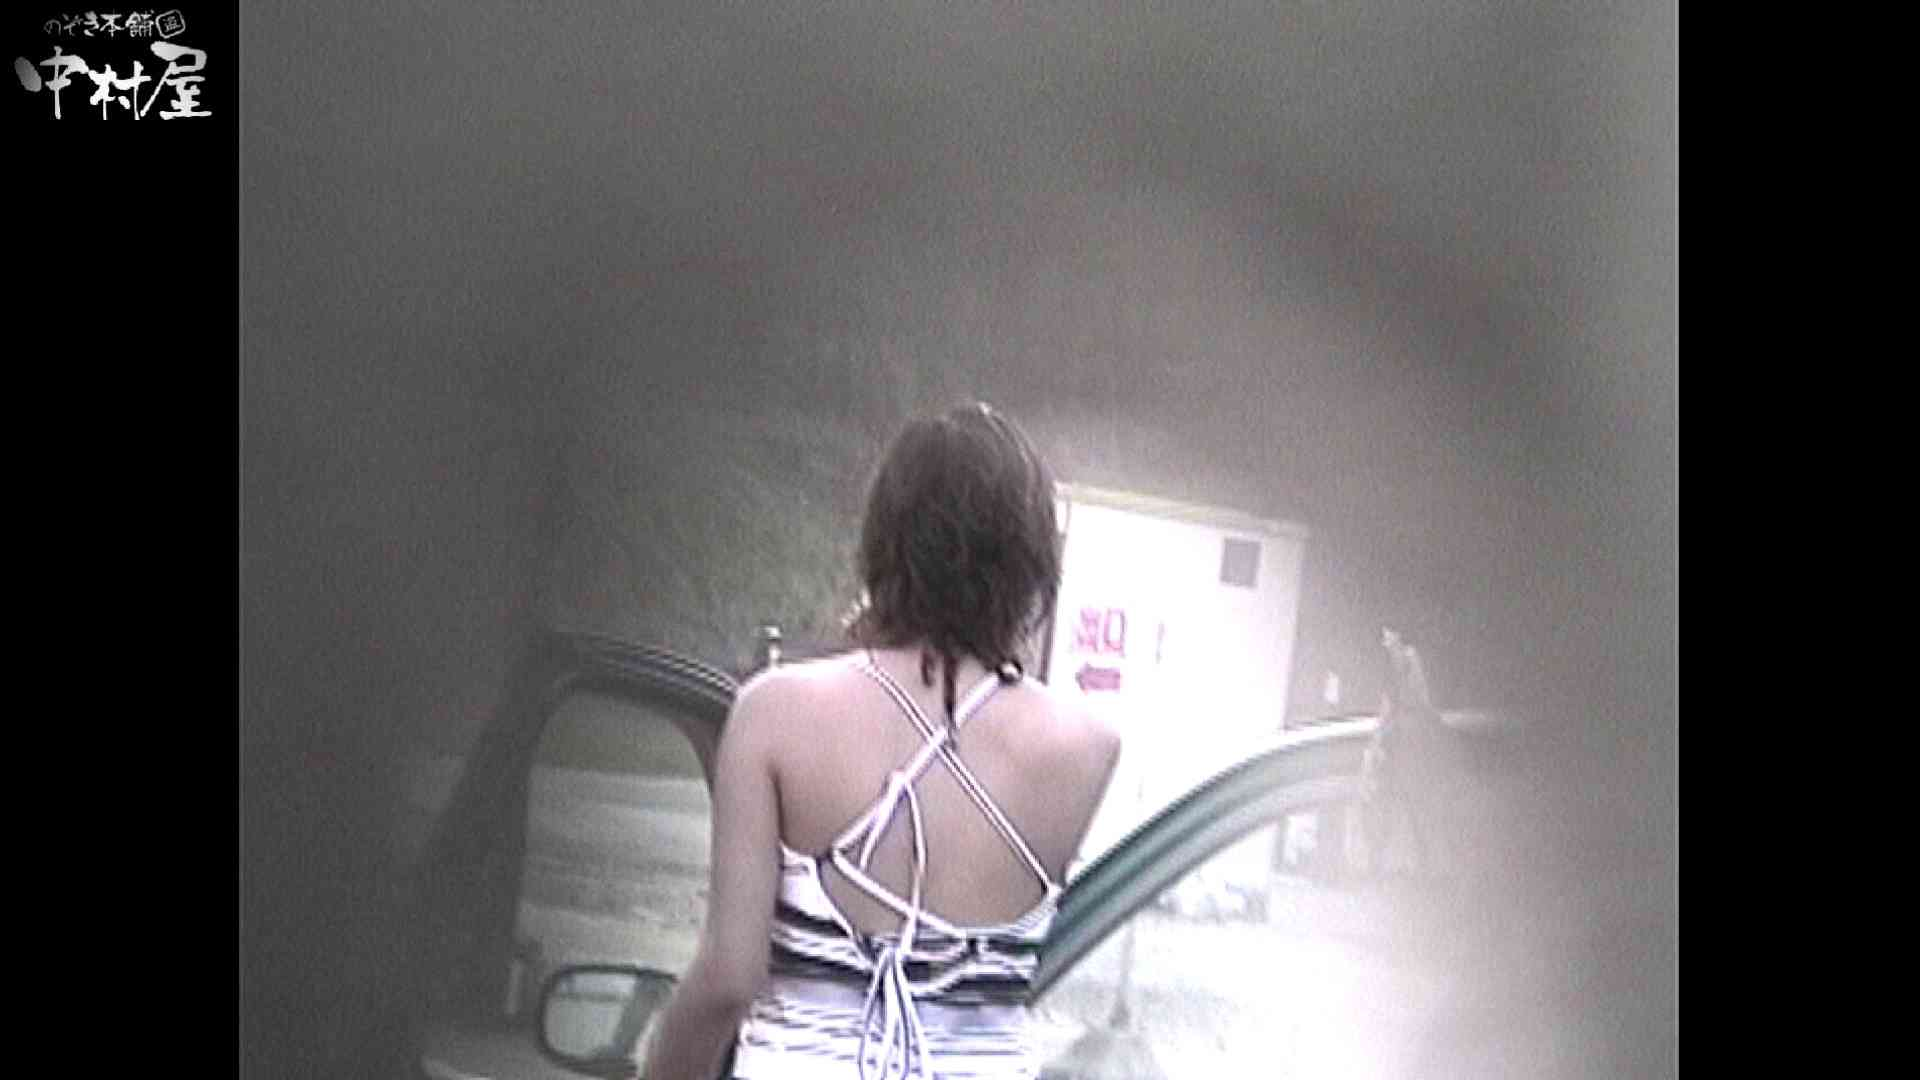 No.16 アニマル柄の水着 レースのパンツにナプキンを装着する金髪お姉さん 接写 セックス無修正動画無料 67連発 54